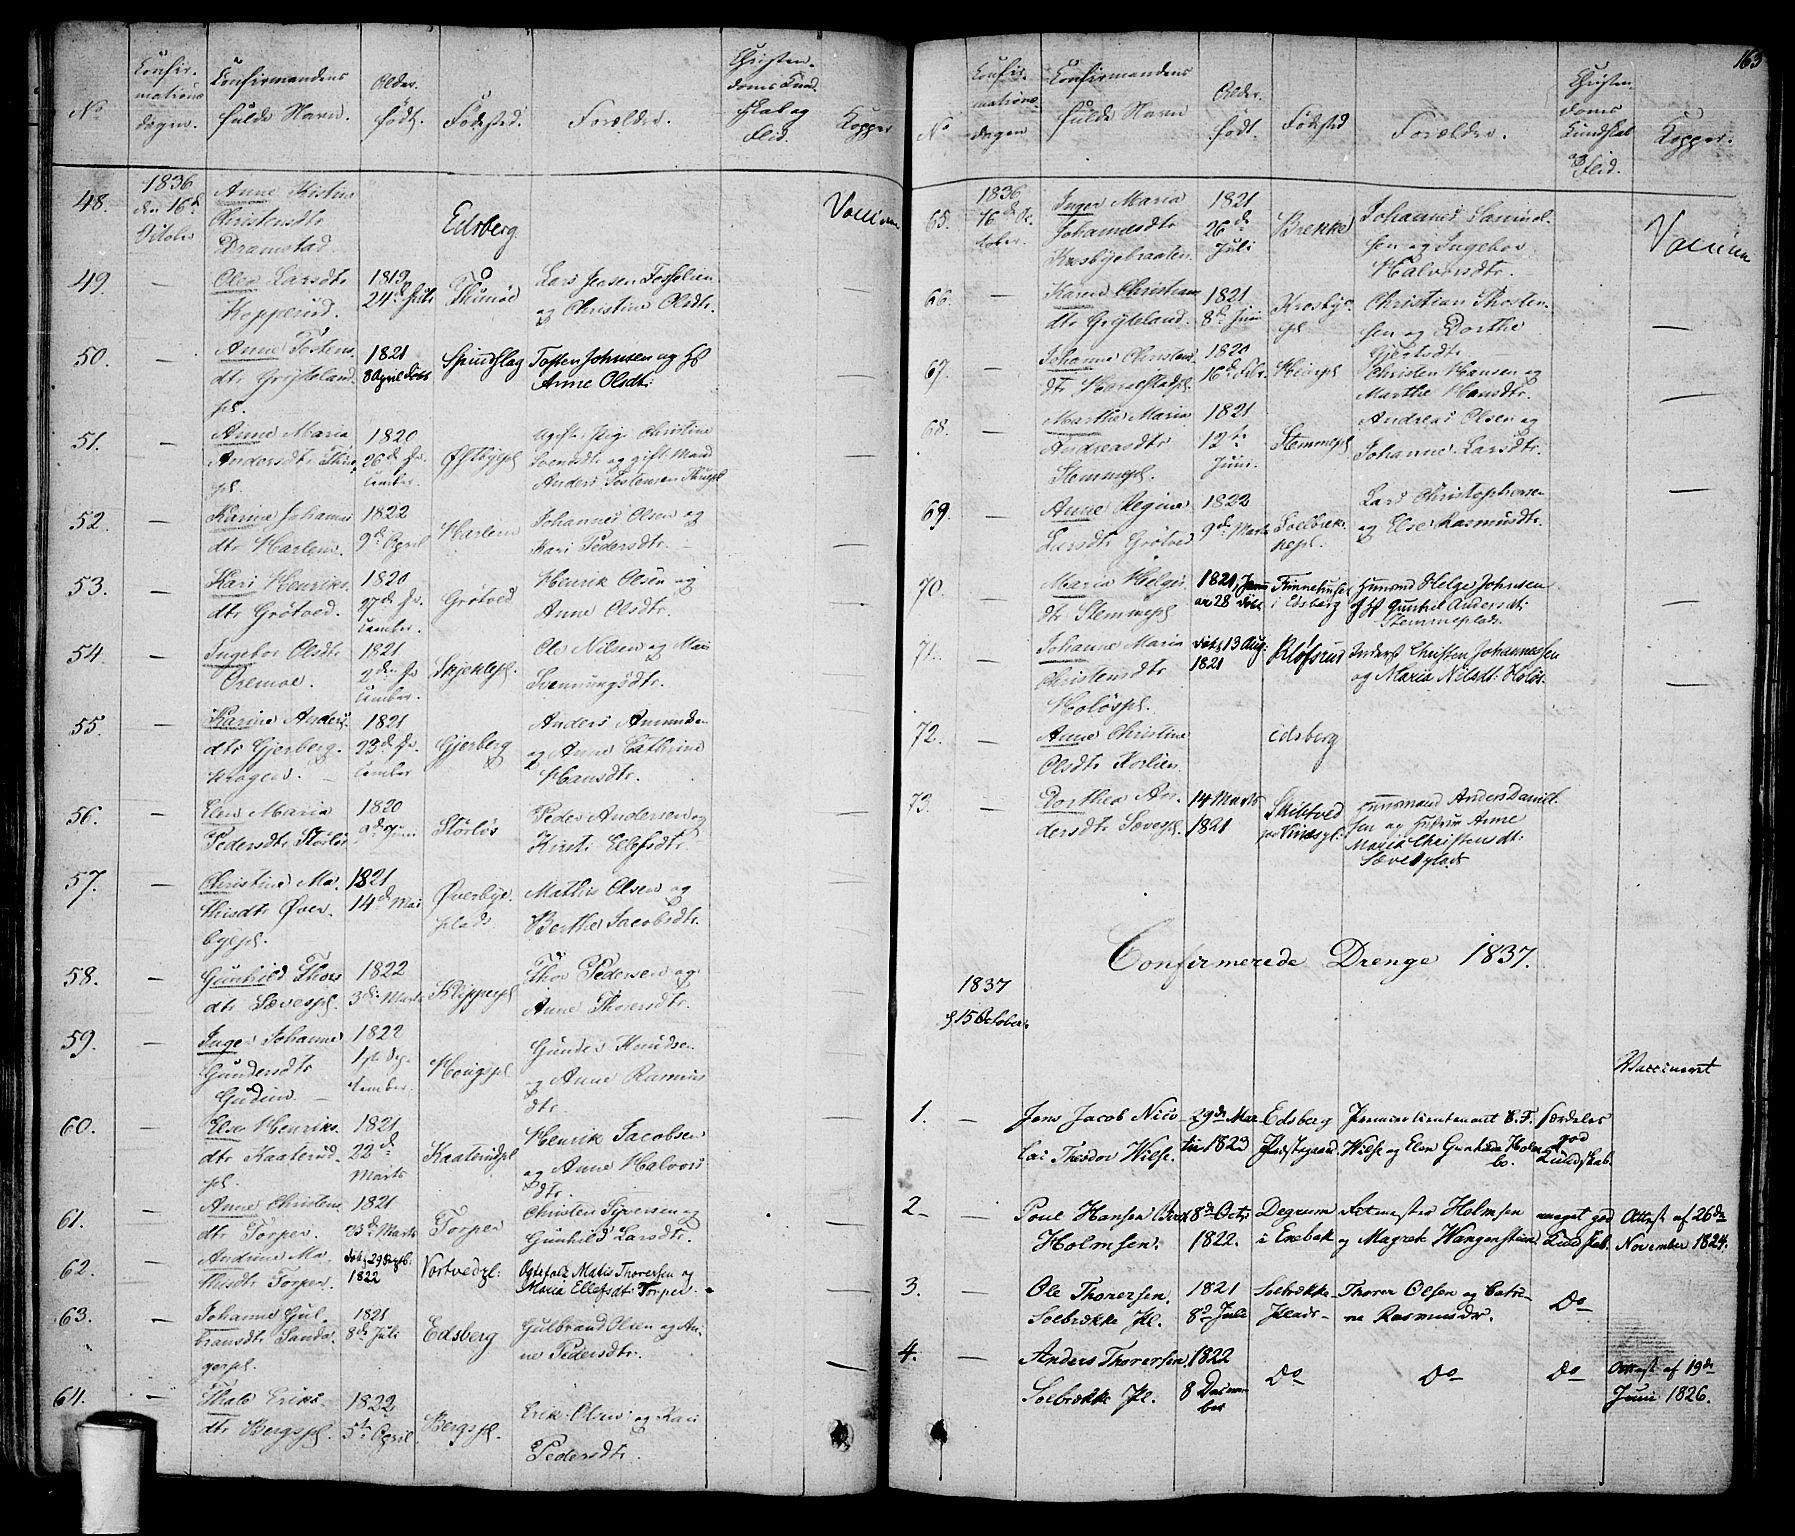 SAO, Rakkestad prestekontor Kirkebøker, F/Fa/L0007: Ministerialbok nr. I 7, 1825-1841, s. 163